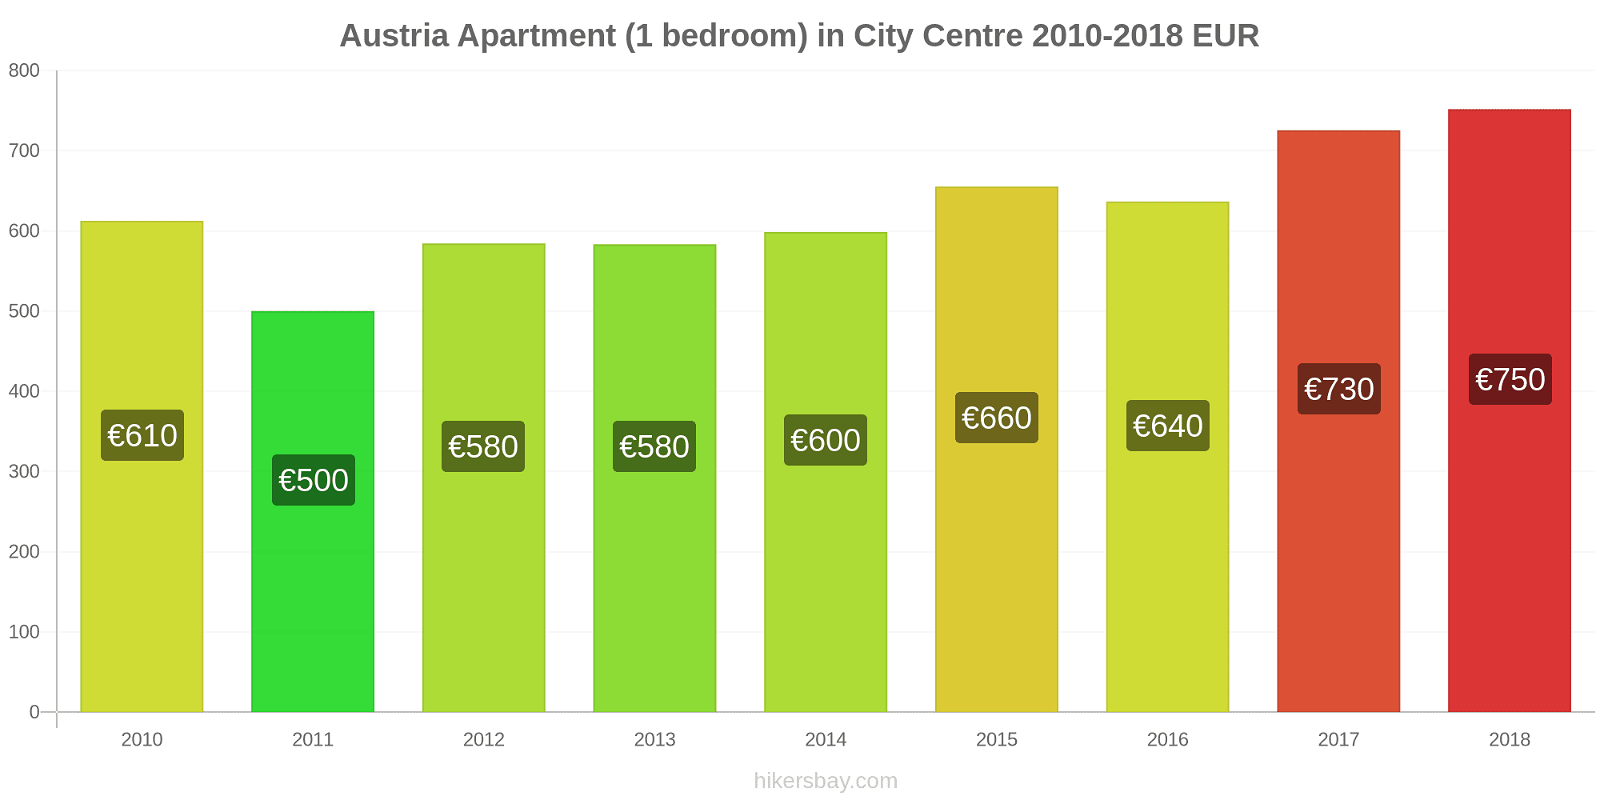 Austria price changes Apartment (1 bedroom) in City Centre hikersbay.com